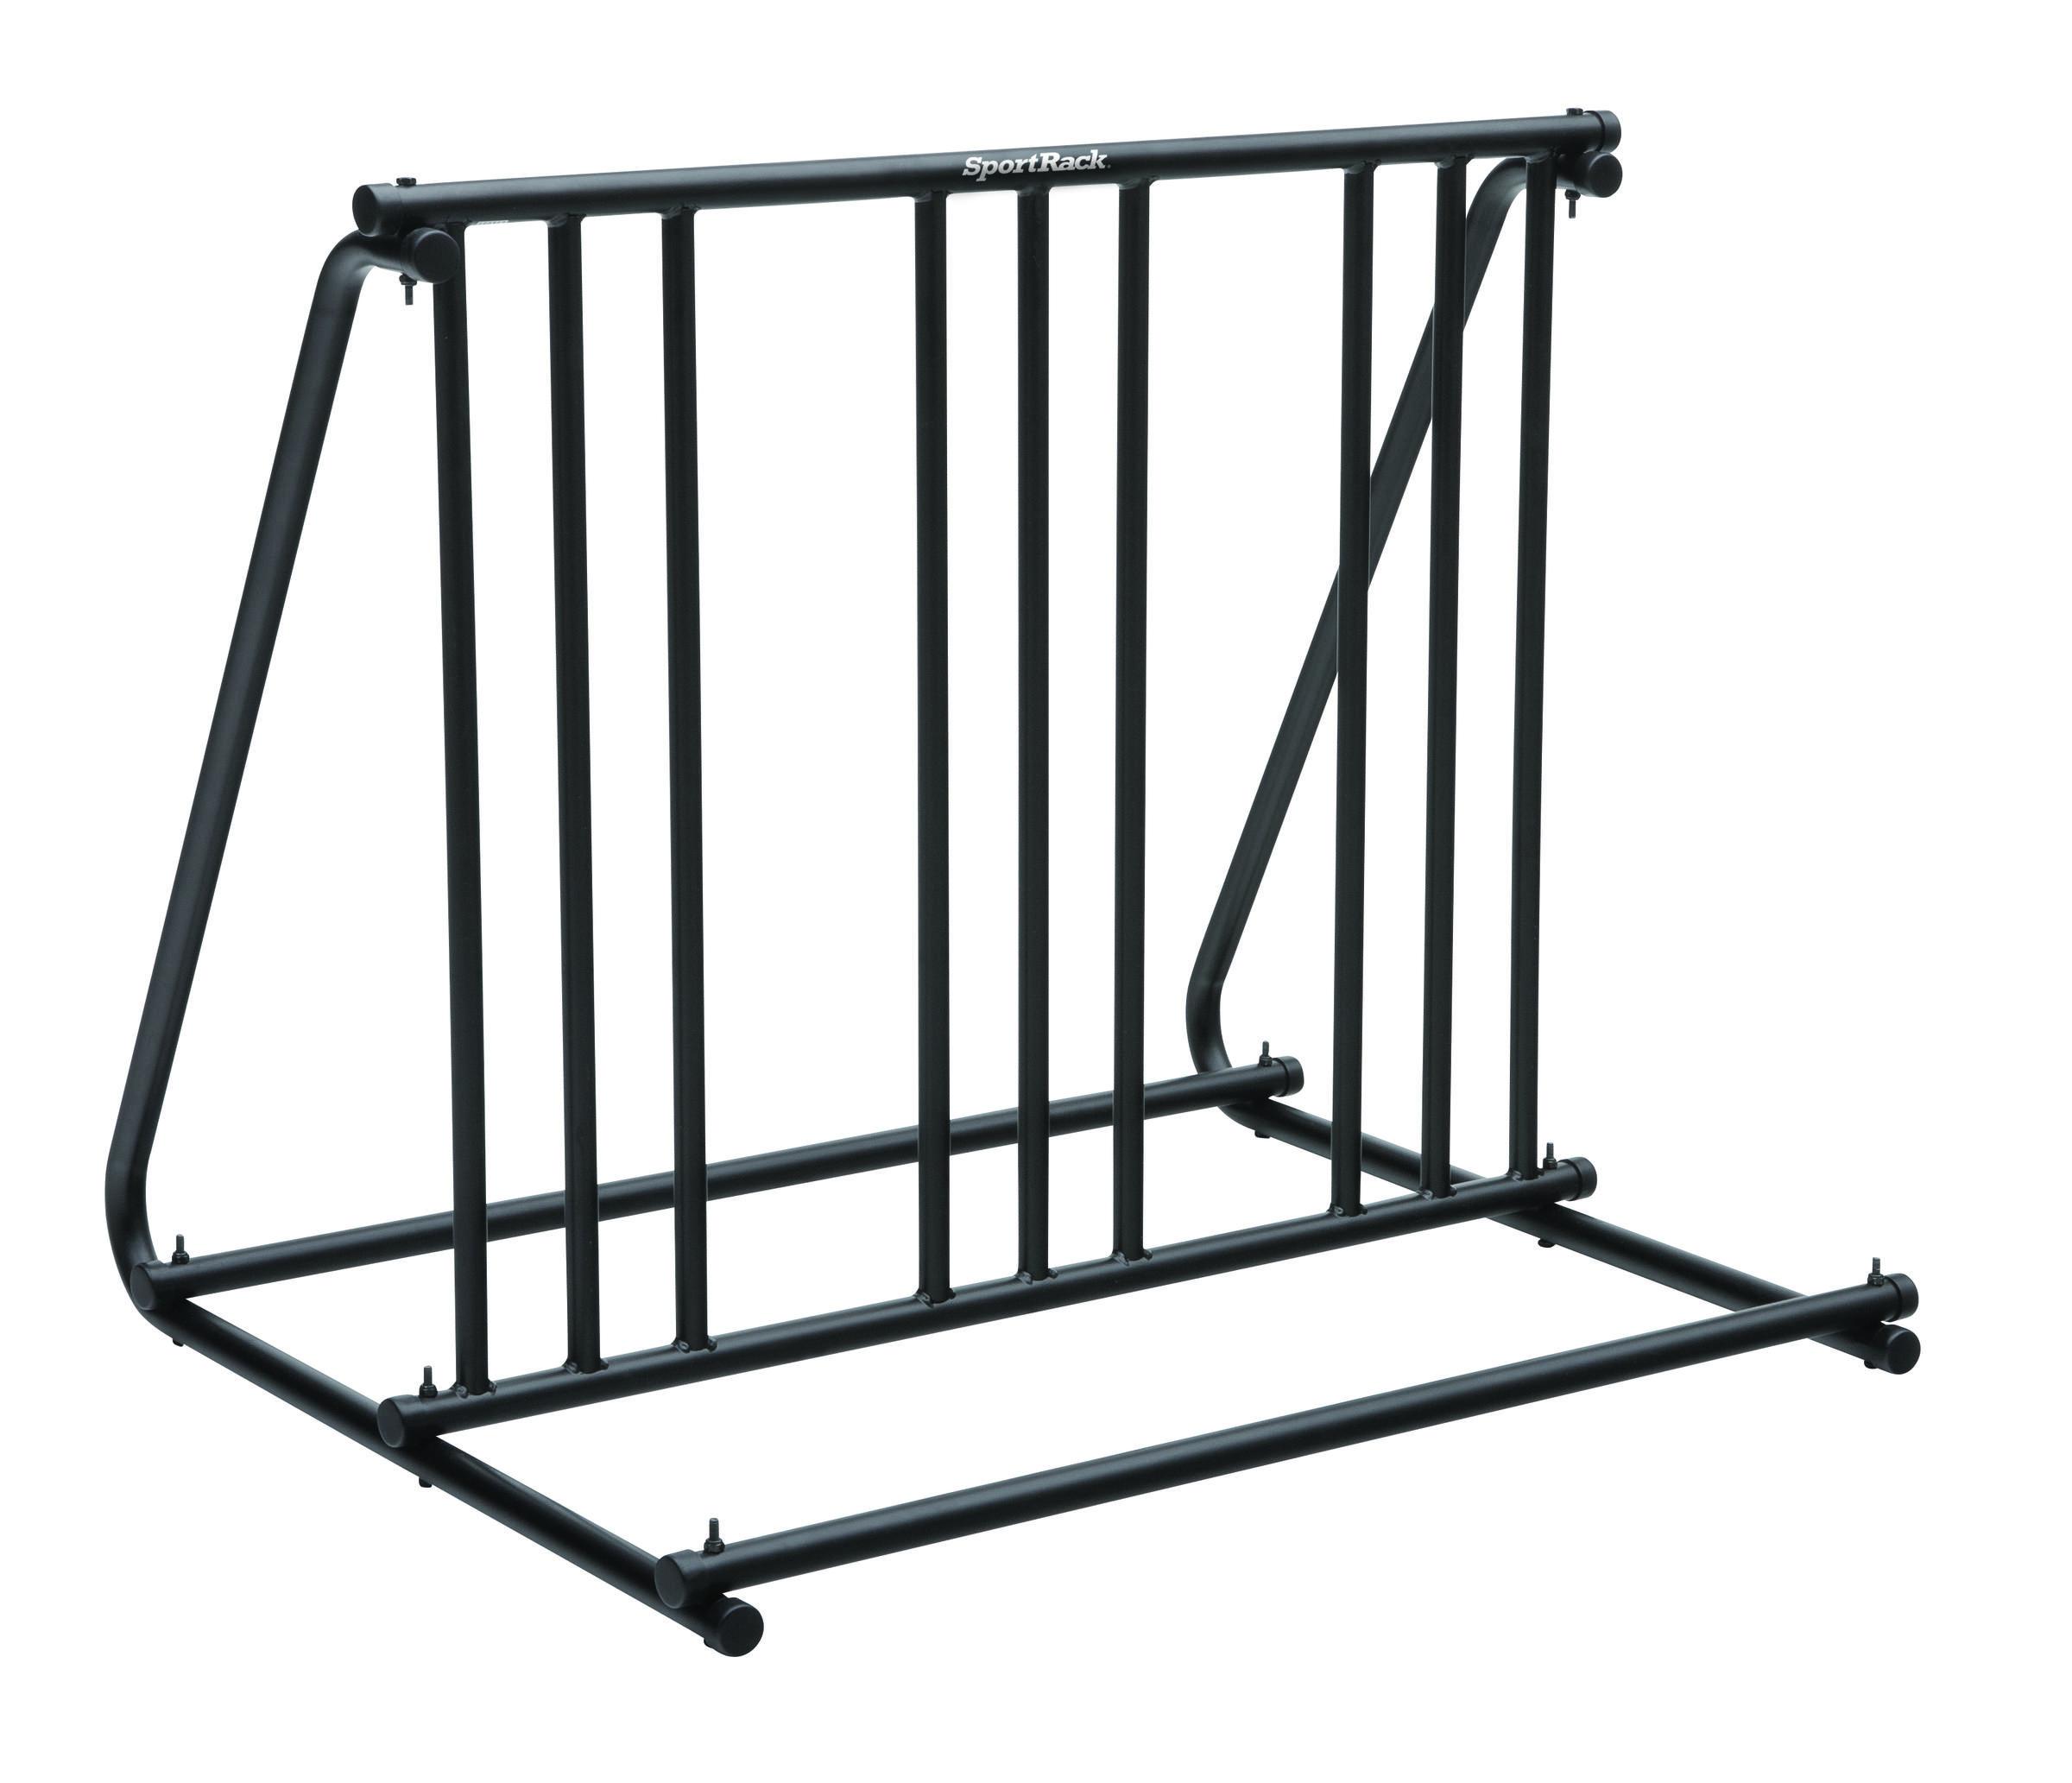 sportrack-bike-stand-34027-1-12-2.jpg